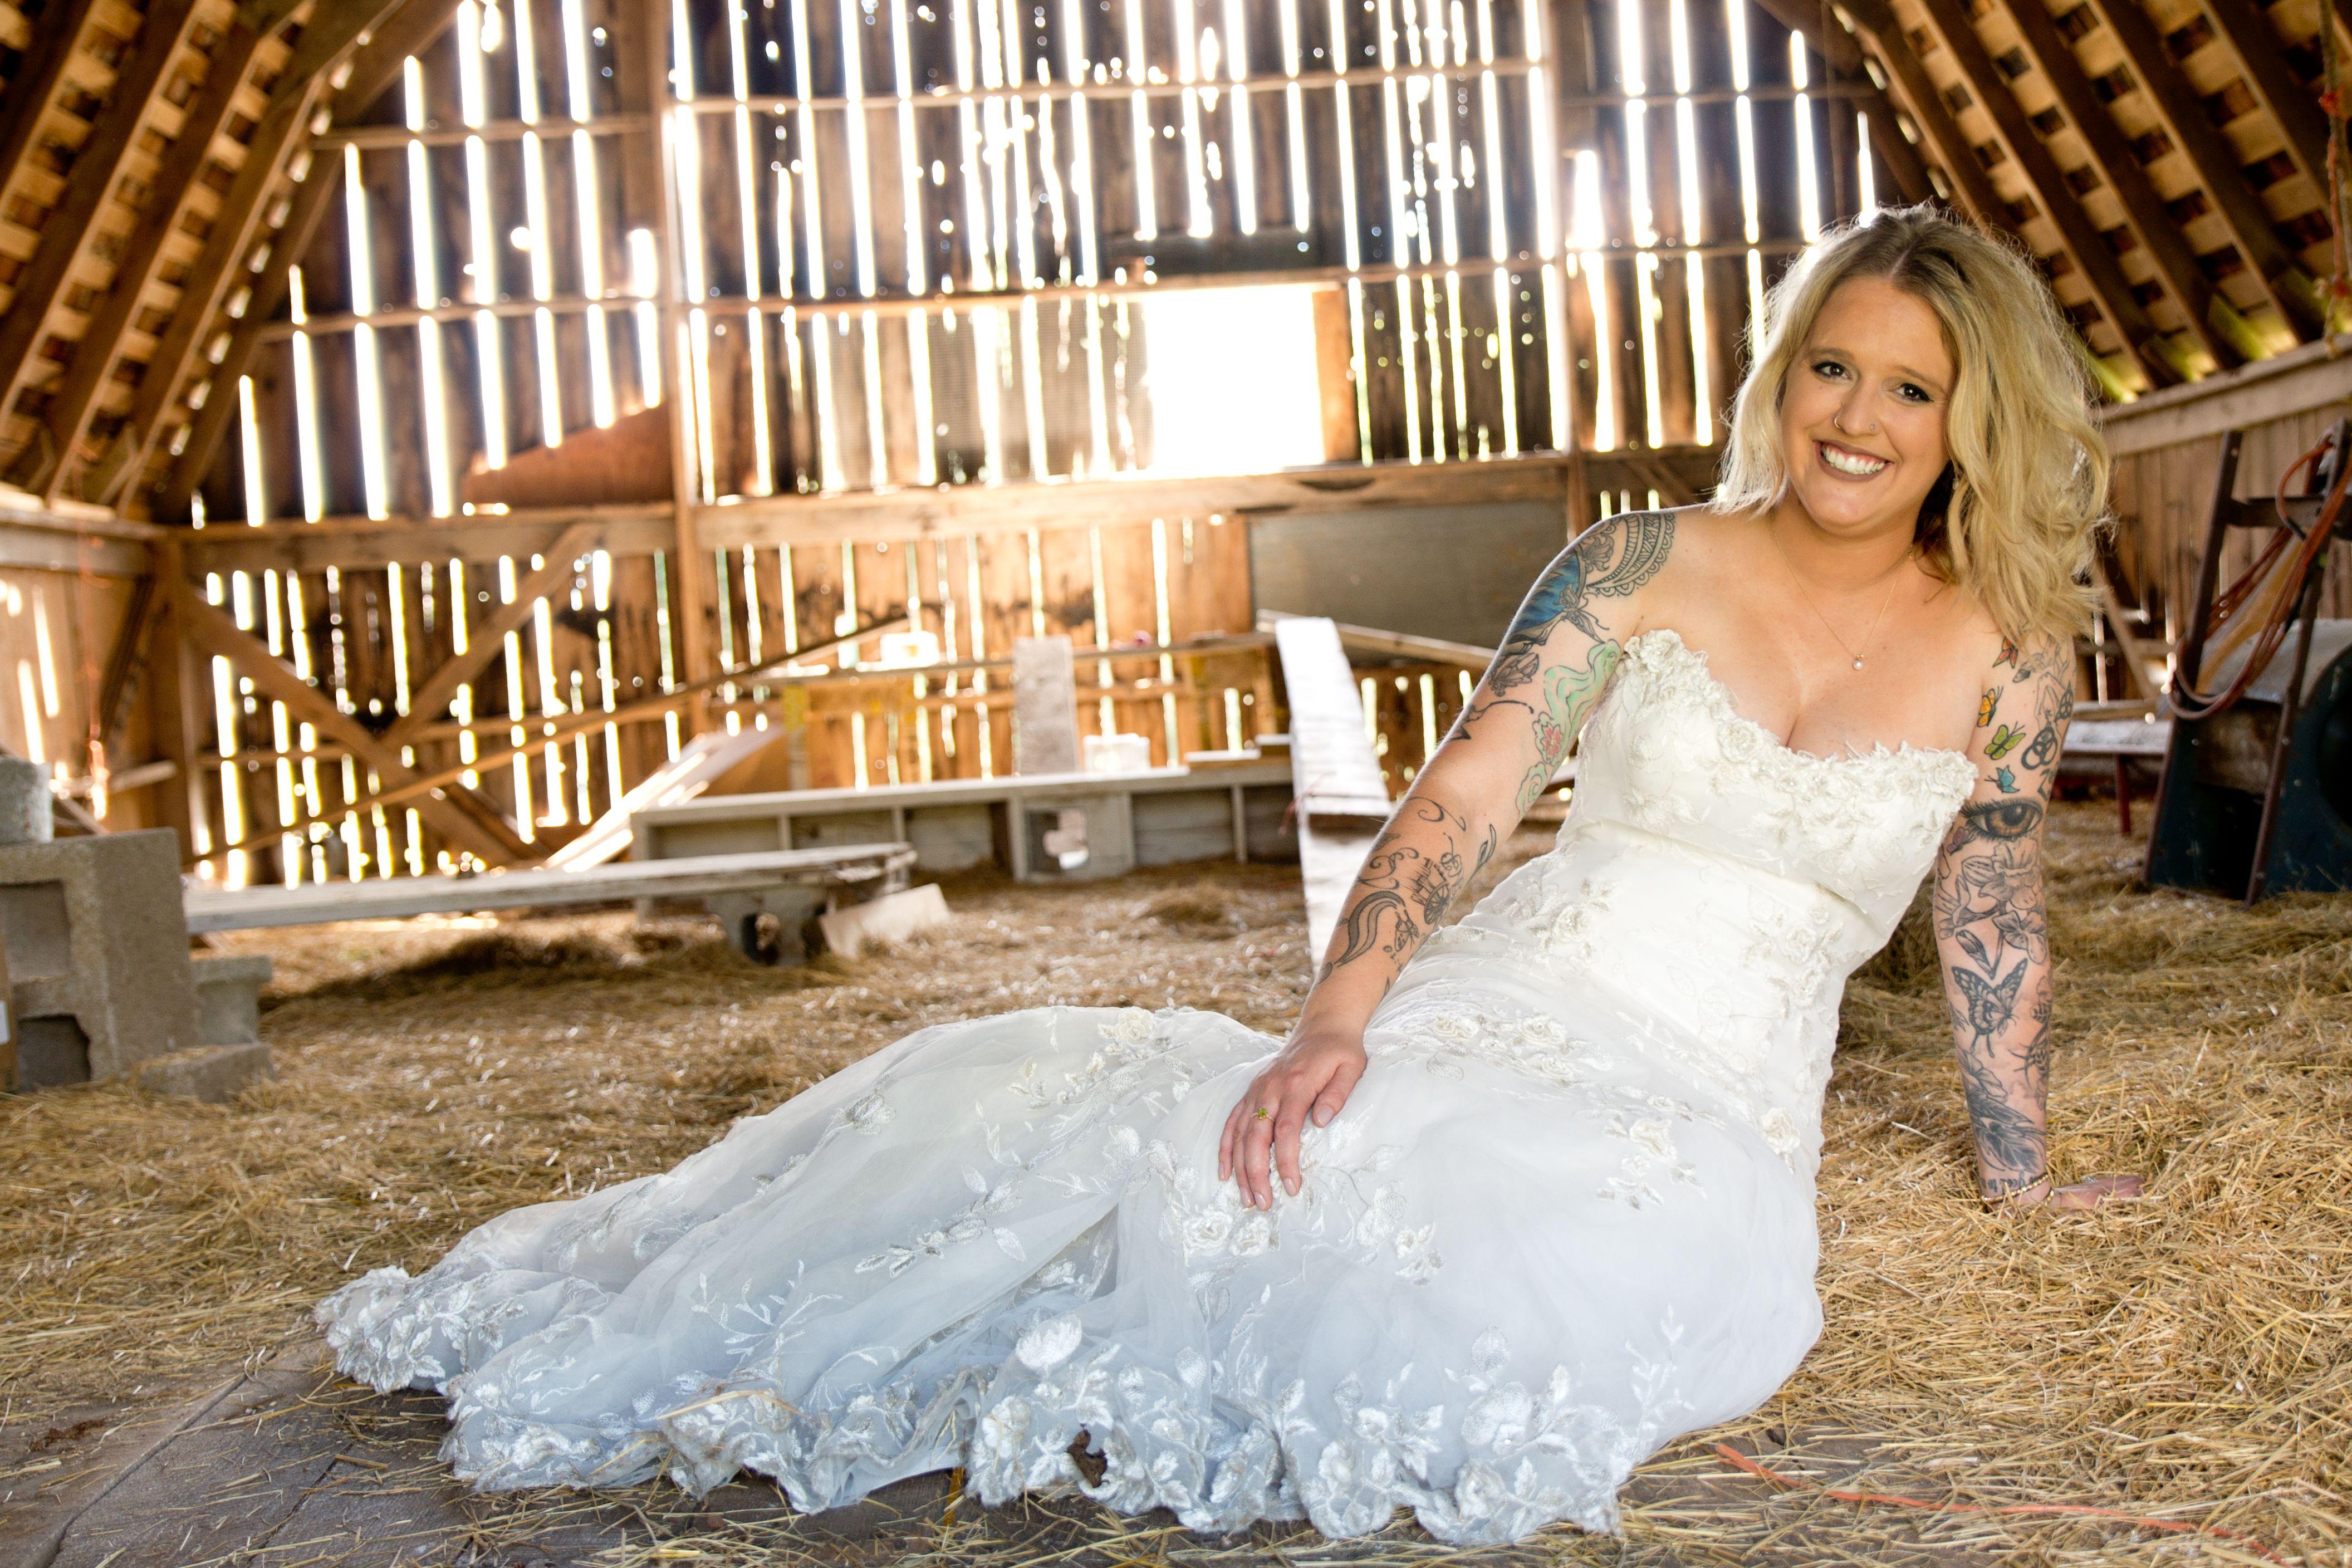 Wedding dresses springfield mo  First anniversary gift ideas  Gambleus Photography Springfield MO